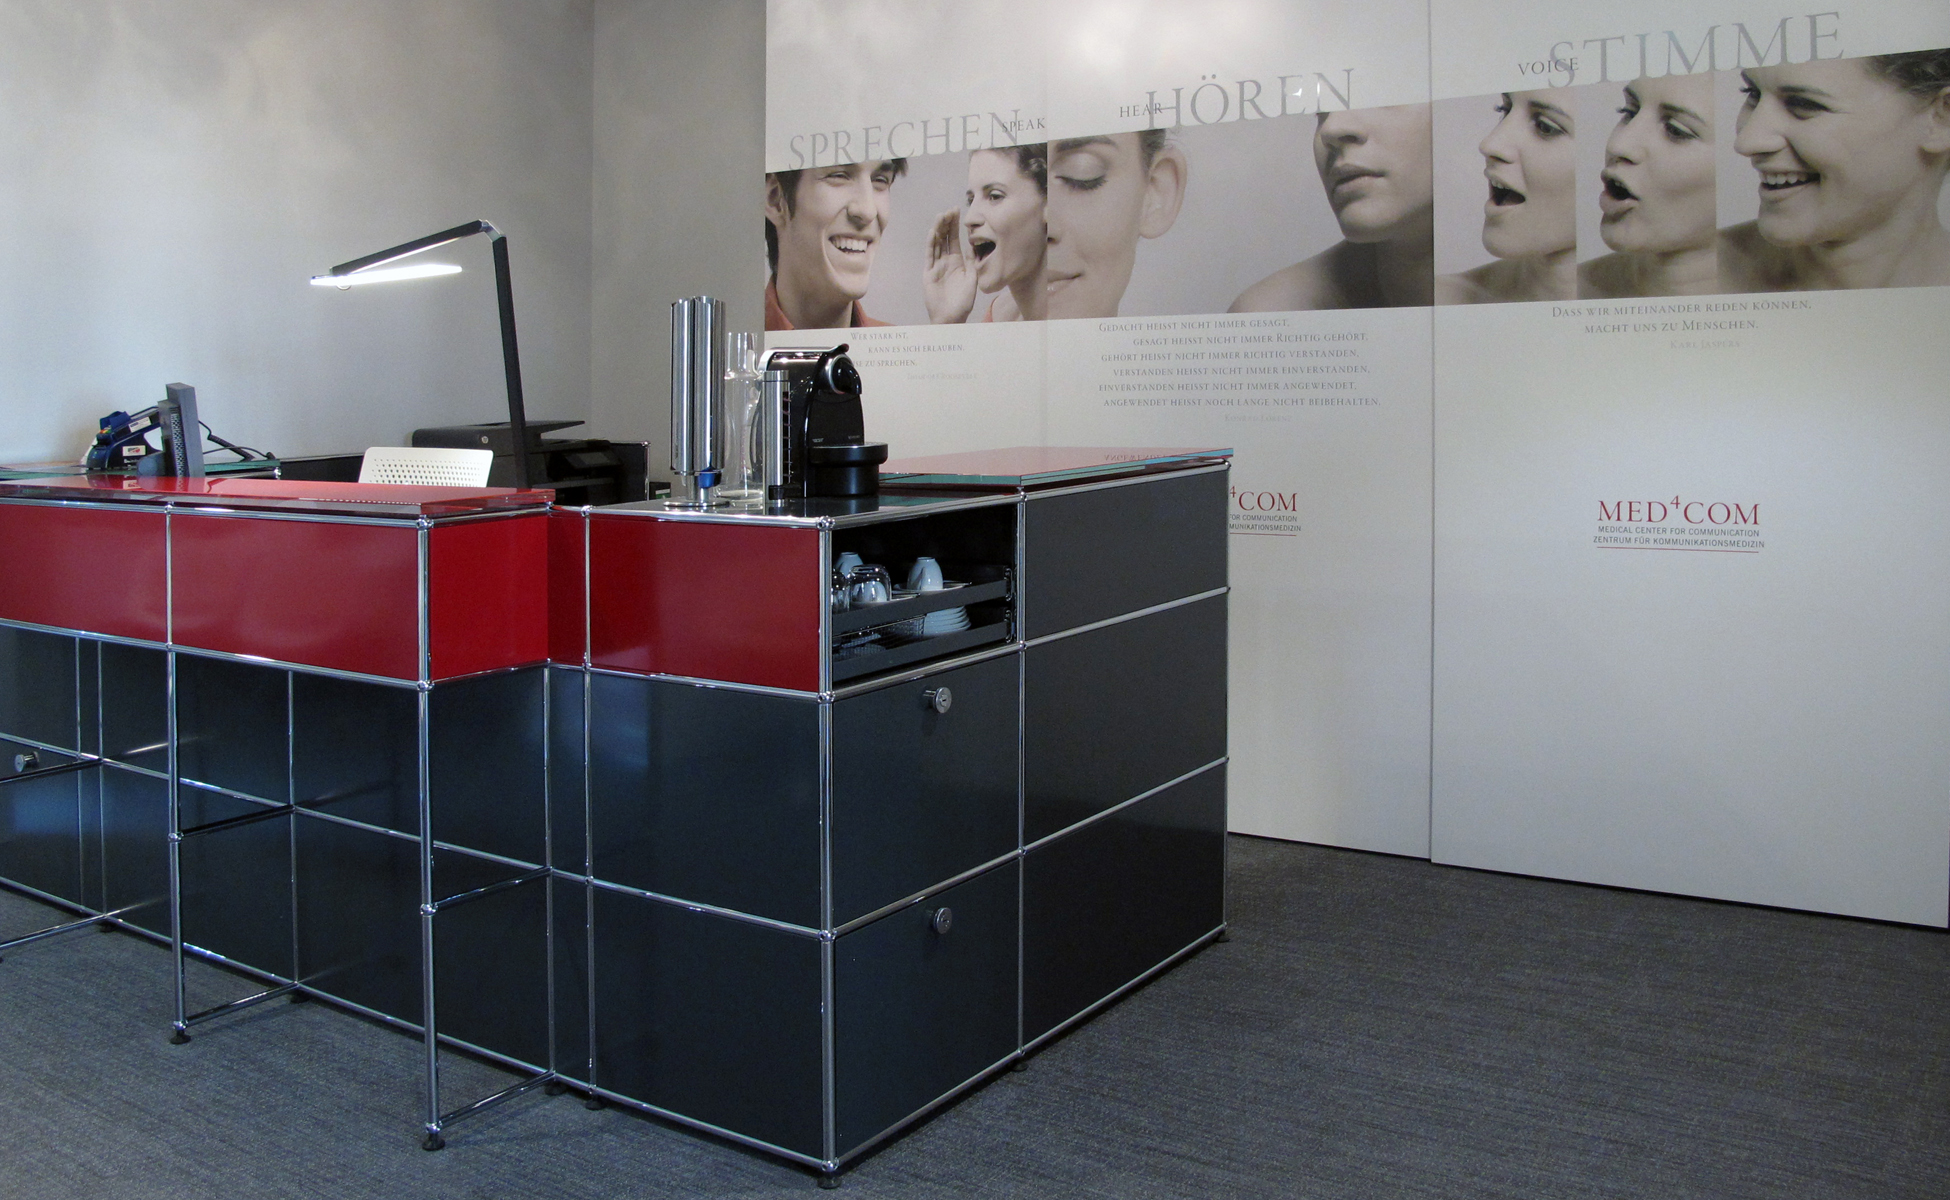 usmwartezimmer empfang usm haller theke rosso profil-22 nimbus roxxane bei steidten+ berlin